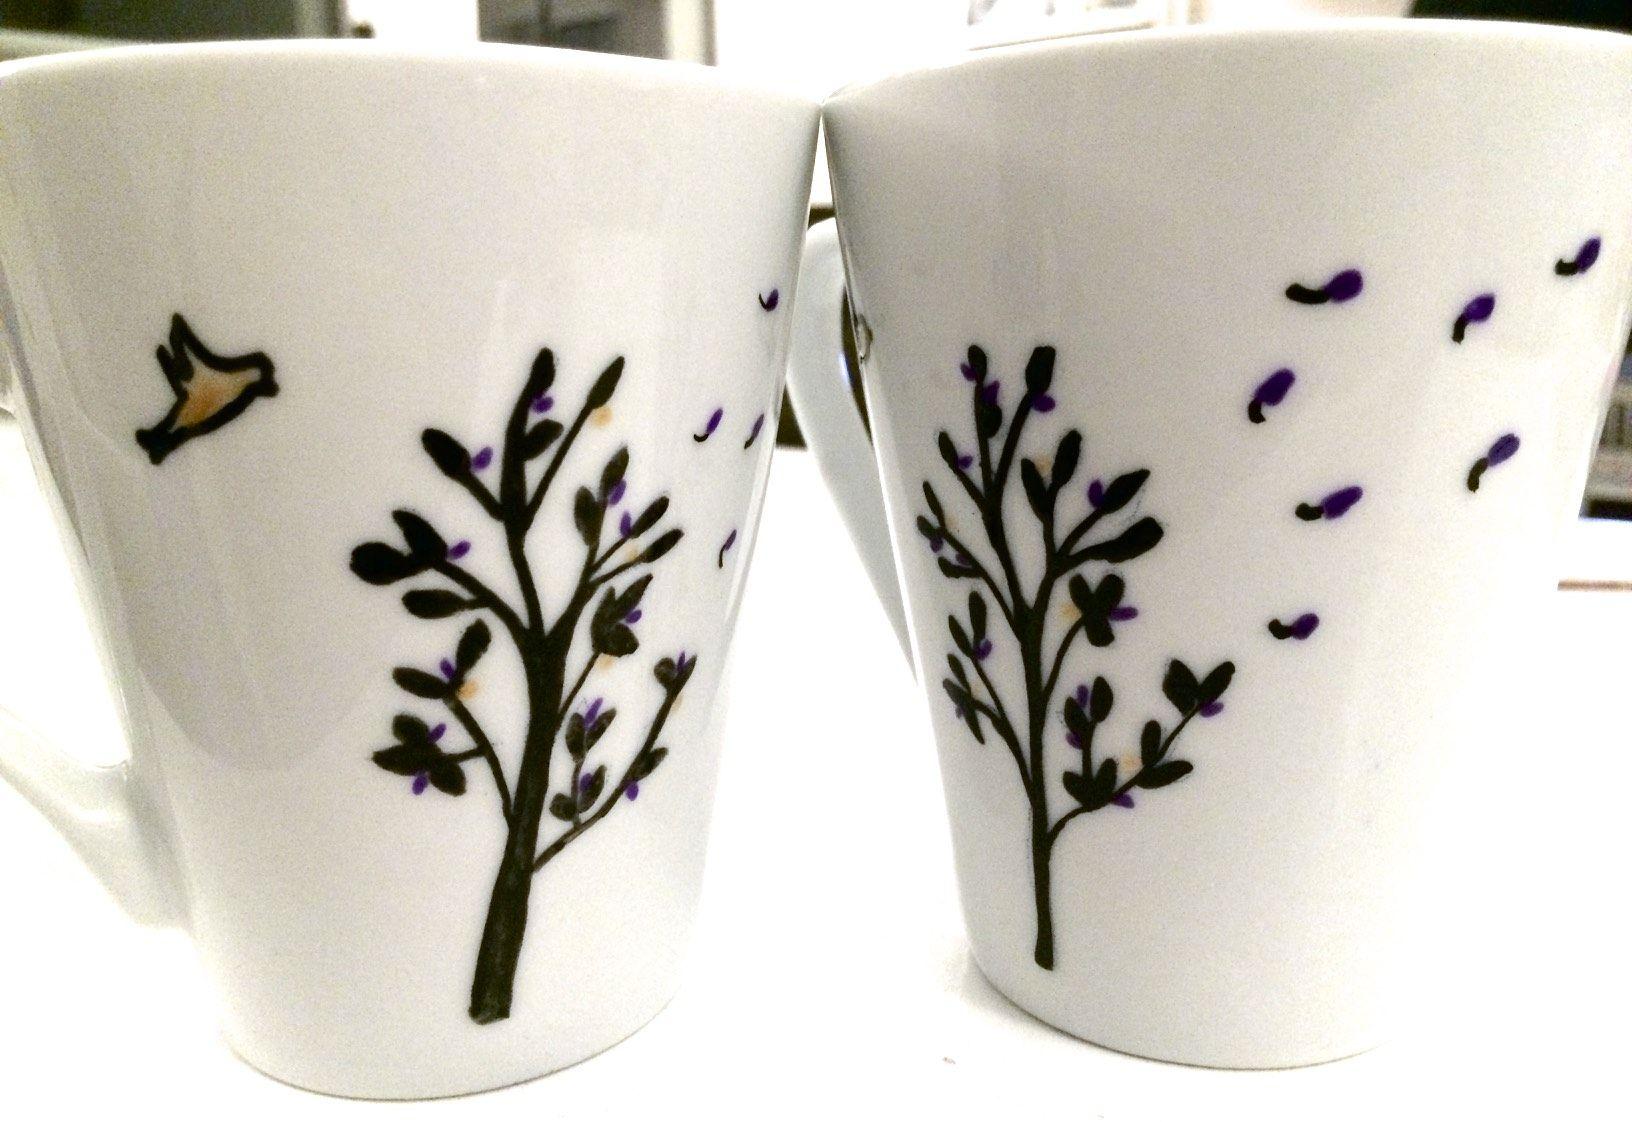 Tuto Peinture Sur Porcelaine diy : tasses décorées - peinture pour porcelaine | tasses